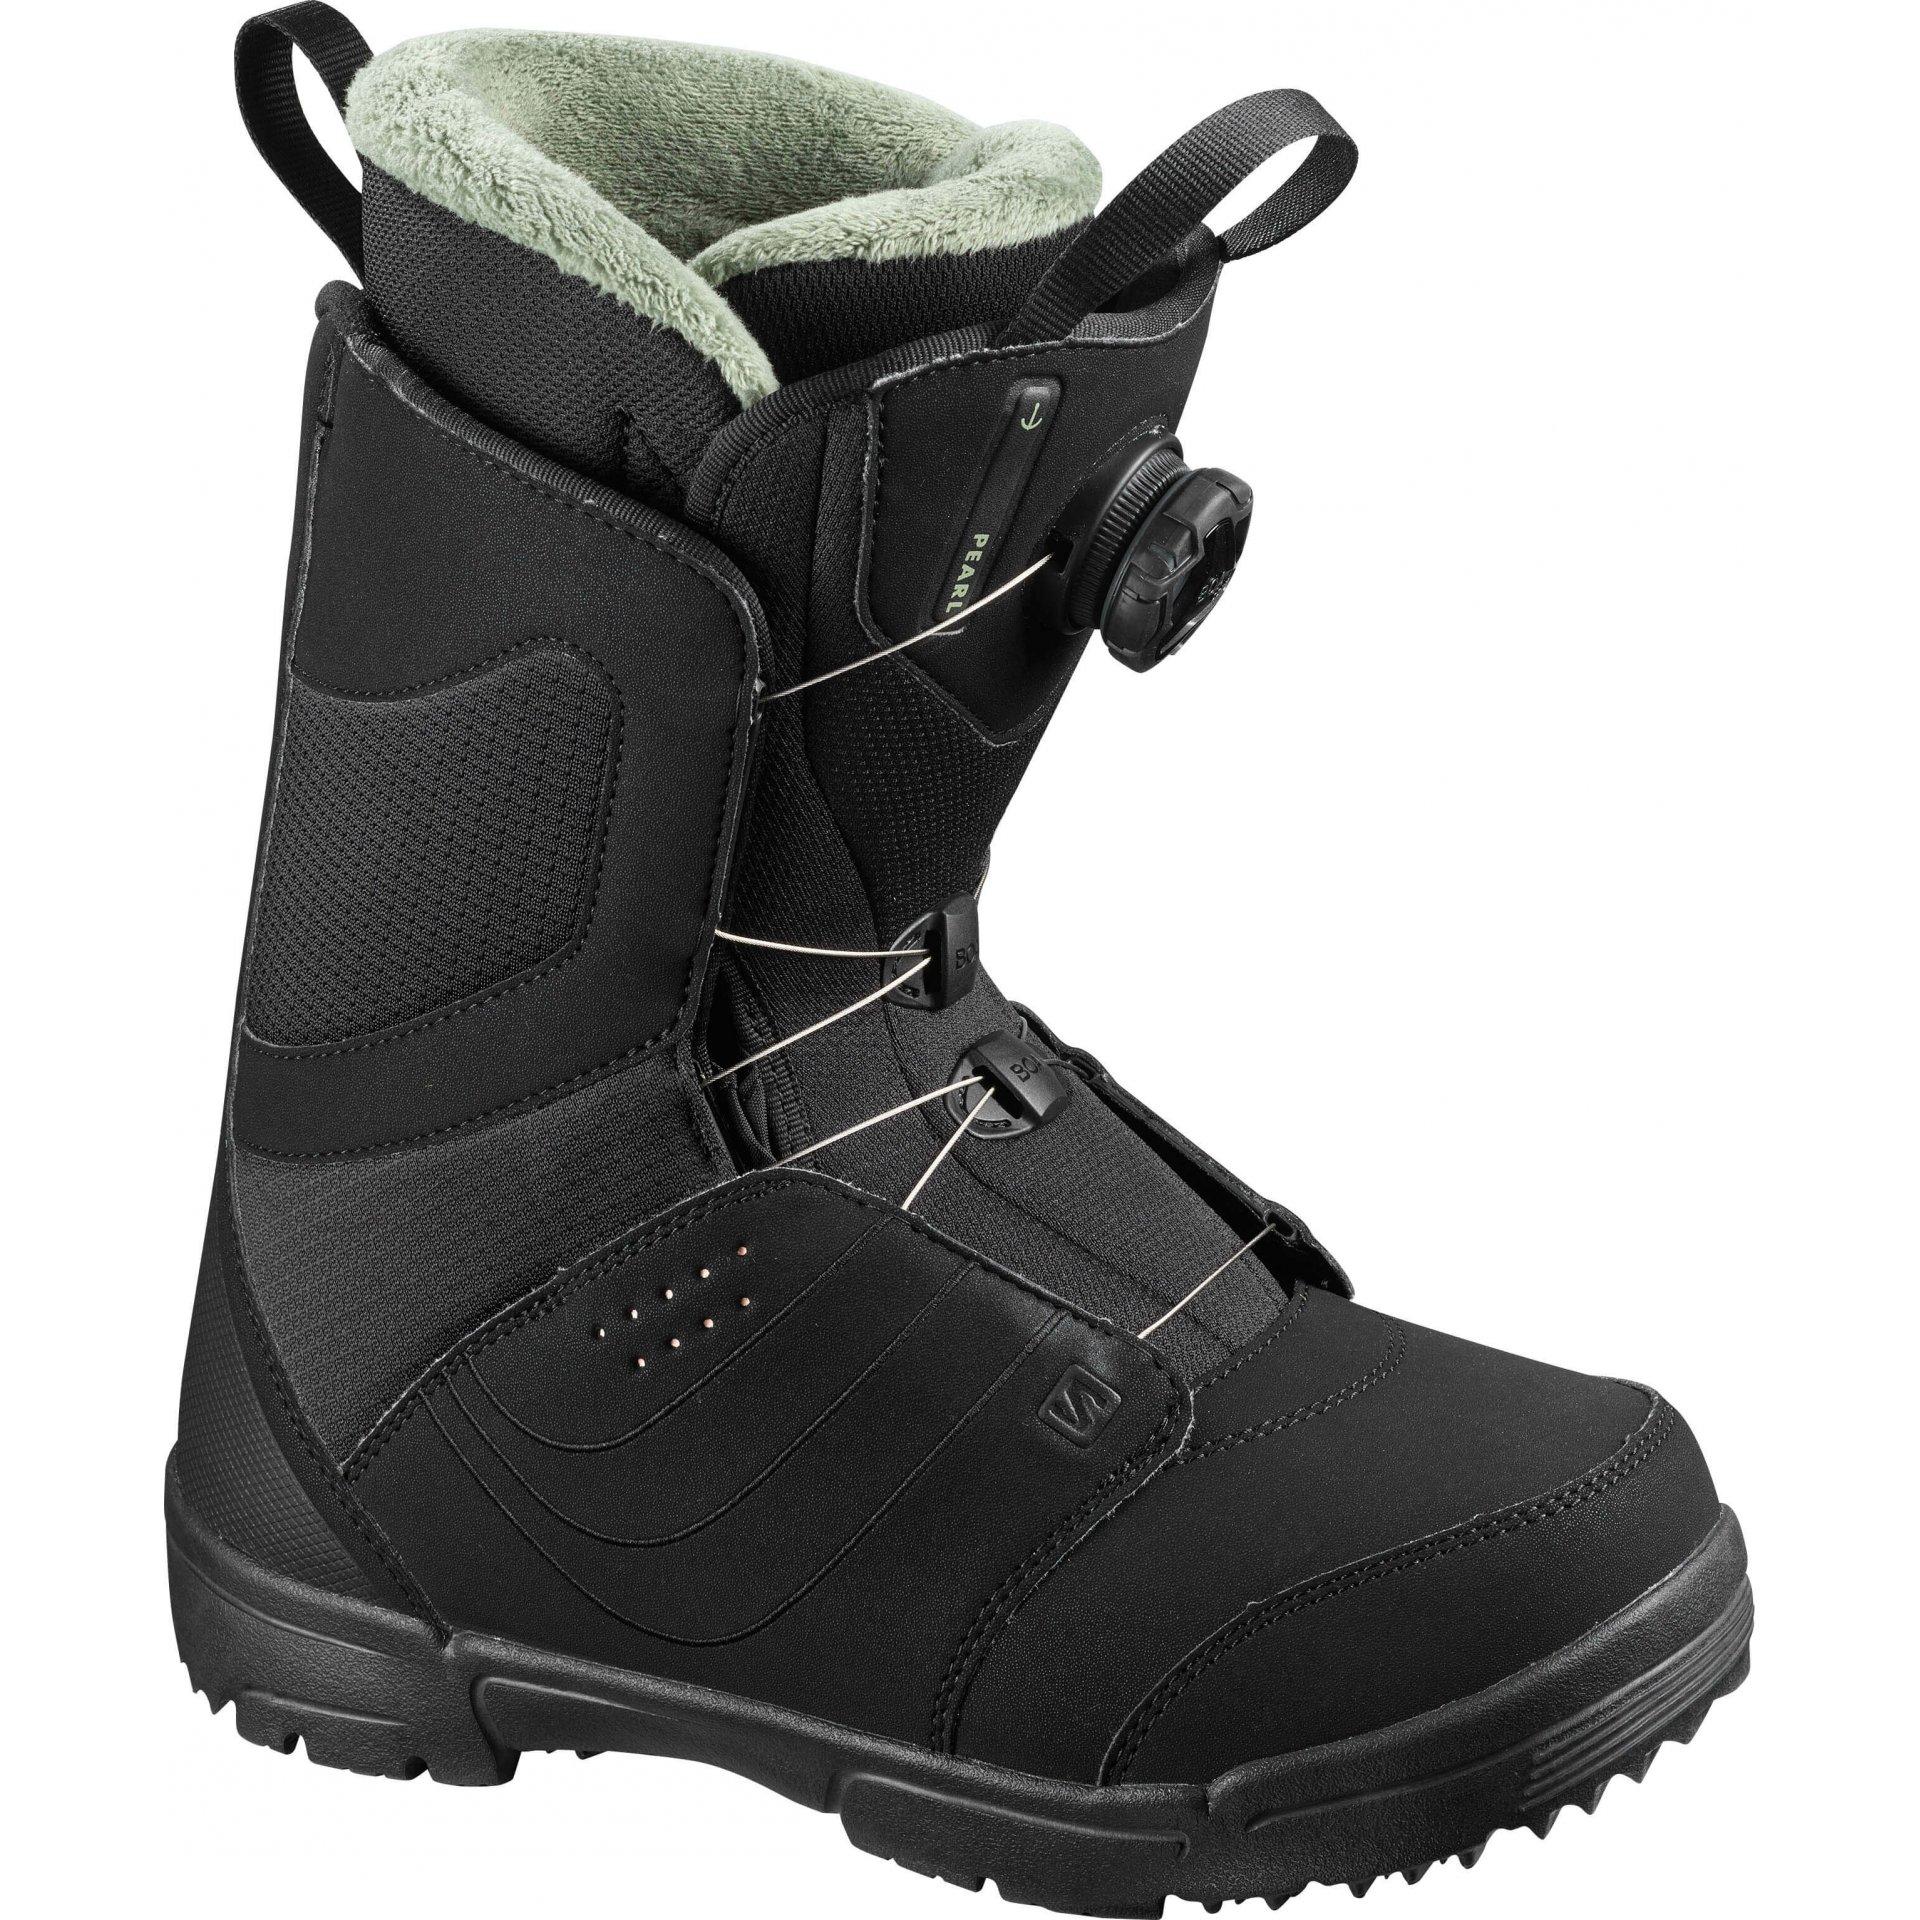 BUTY SNOWBOARDOWE SALOMON PEARL BOA L412117